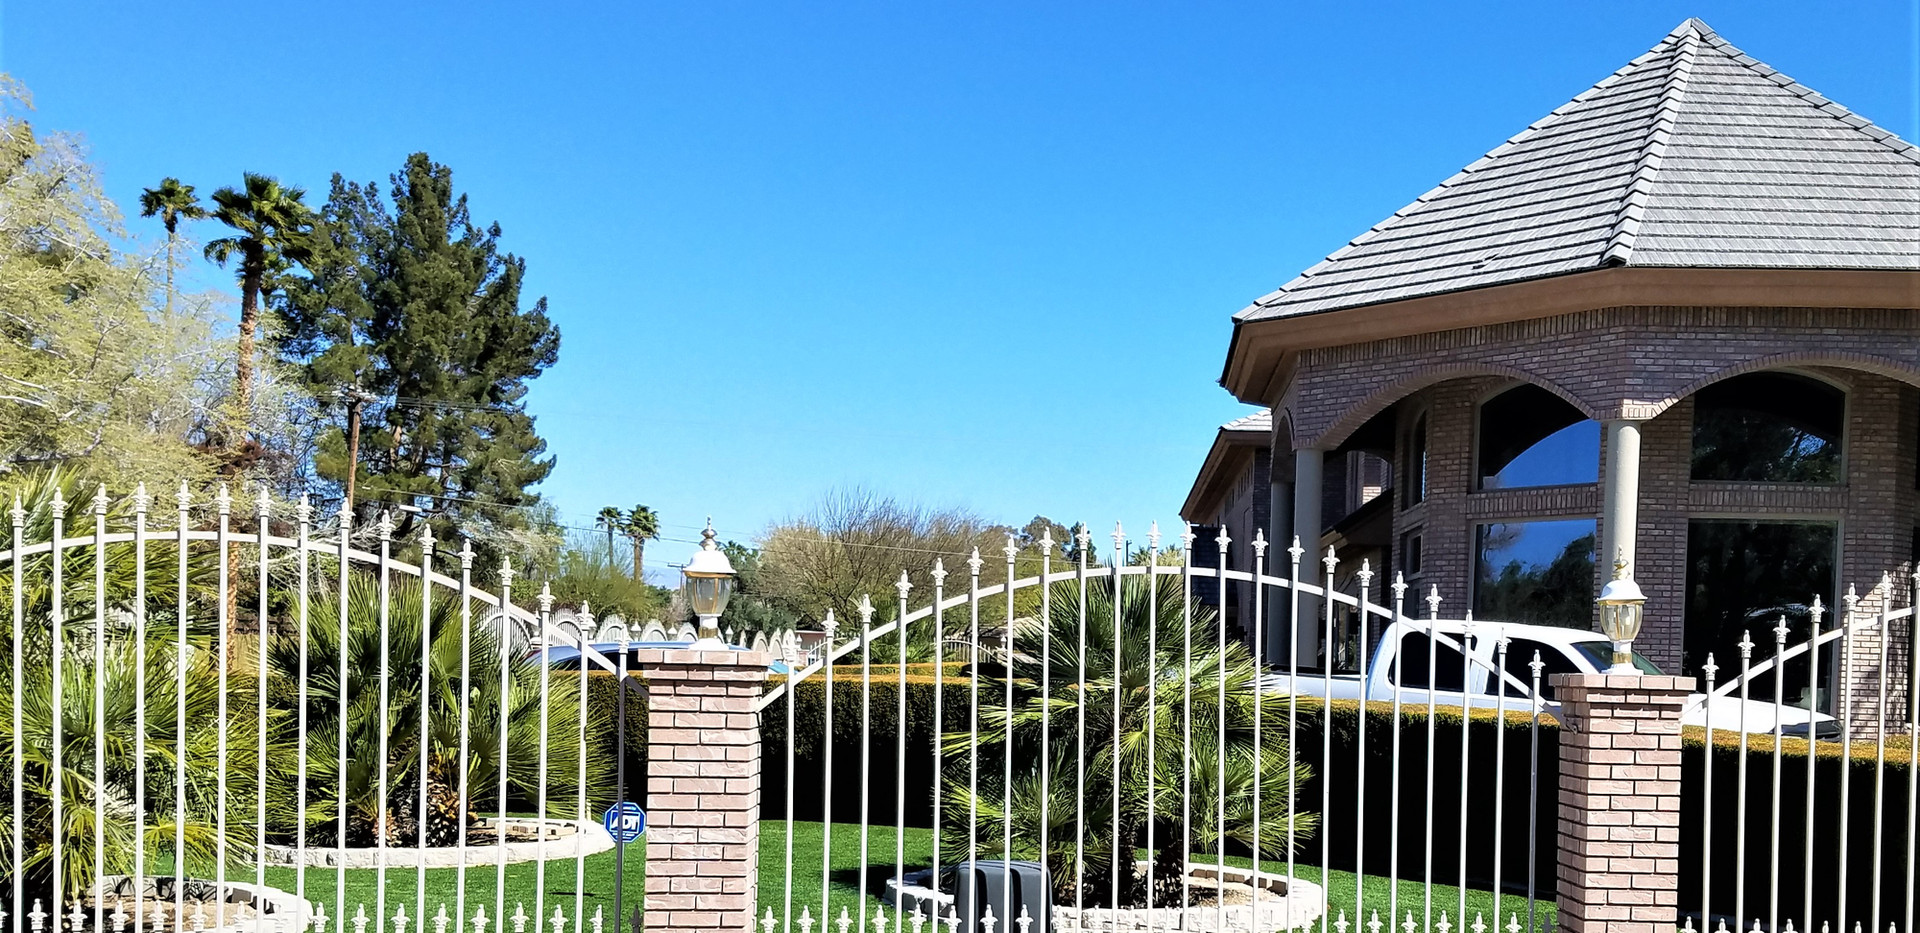 Residential -The Tiberti Fence Company - Las Vegas, Nevada